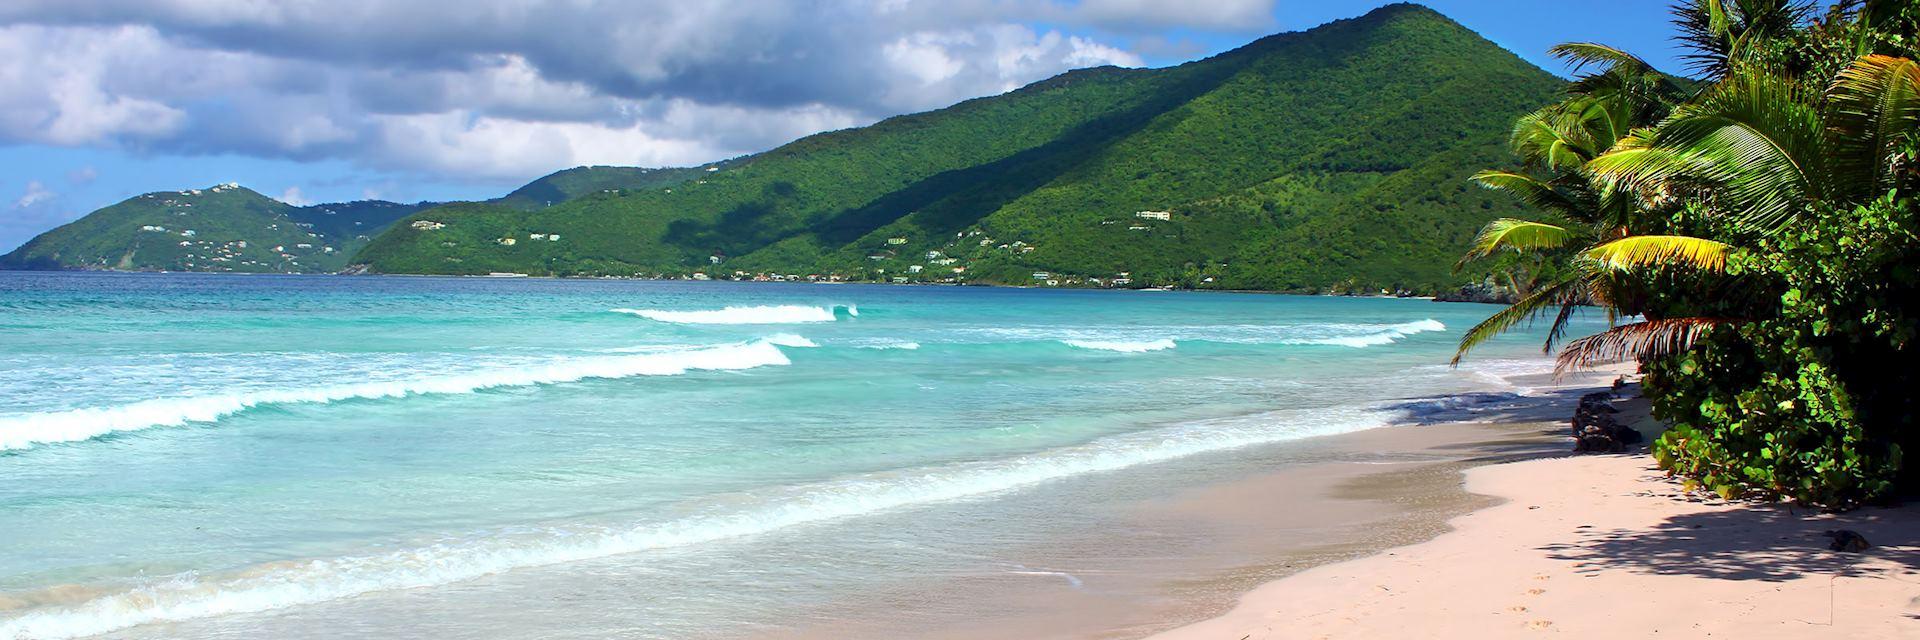 Smugglers Cove Beach, Tortola